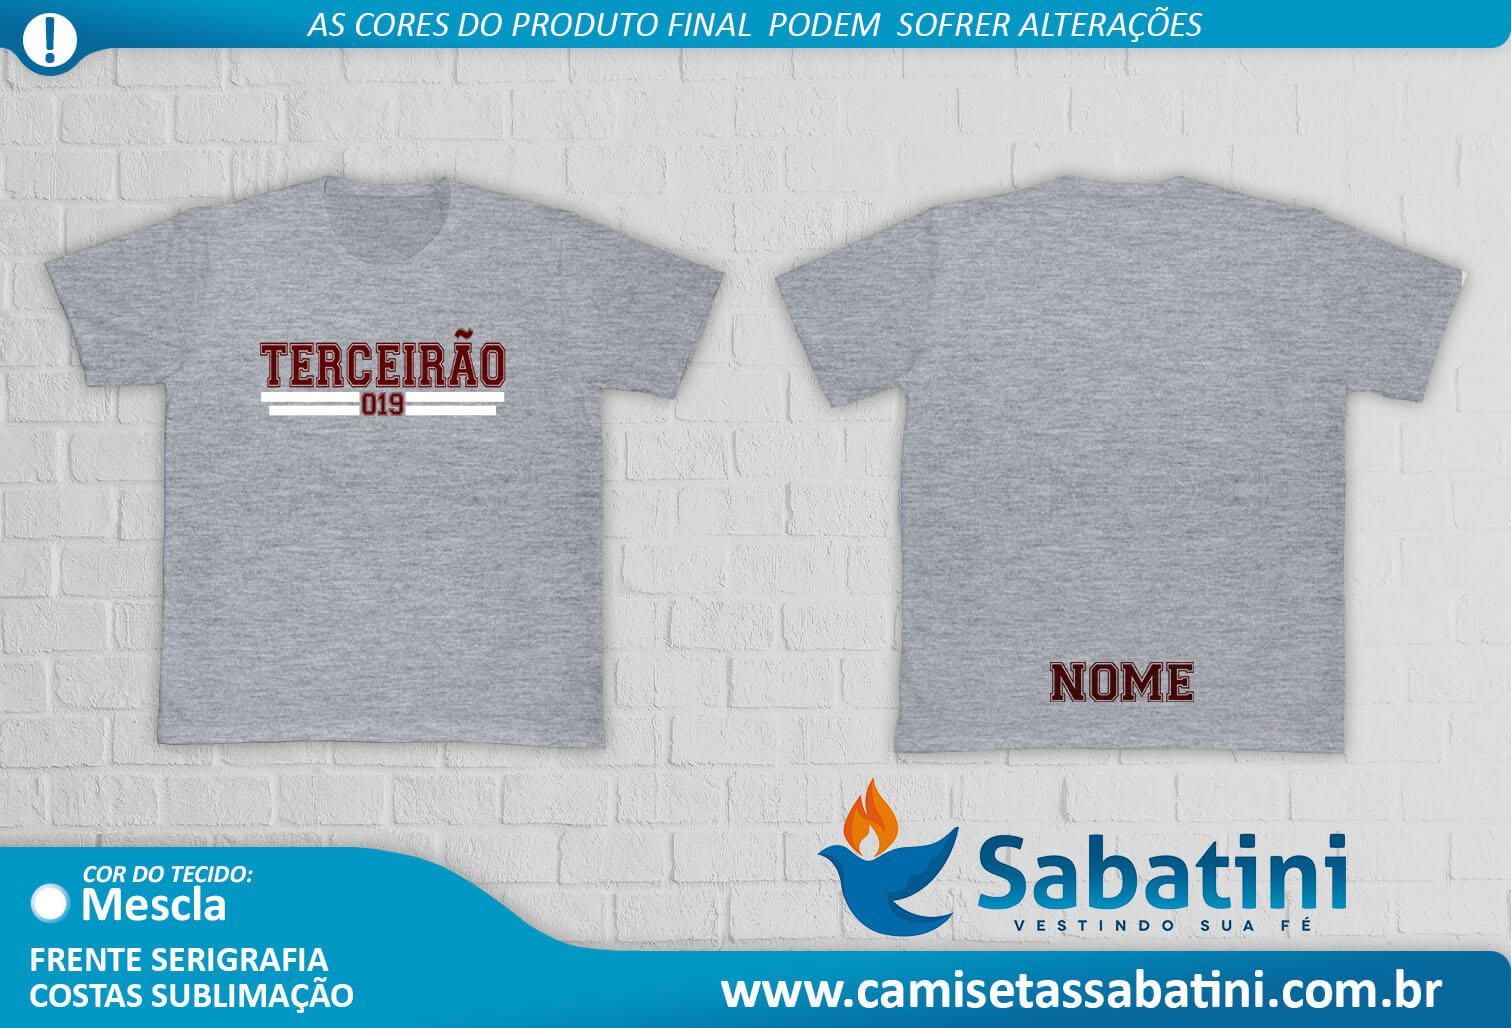 Camiseta Personalizada -TERCEIRÃO - IPORÃ  - PR- ID:13712772  - Camisetas Sabatini